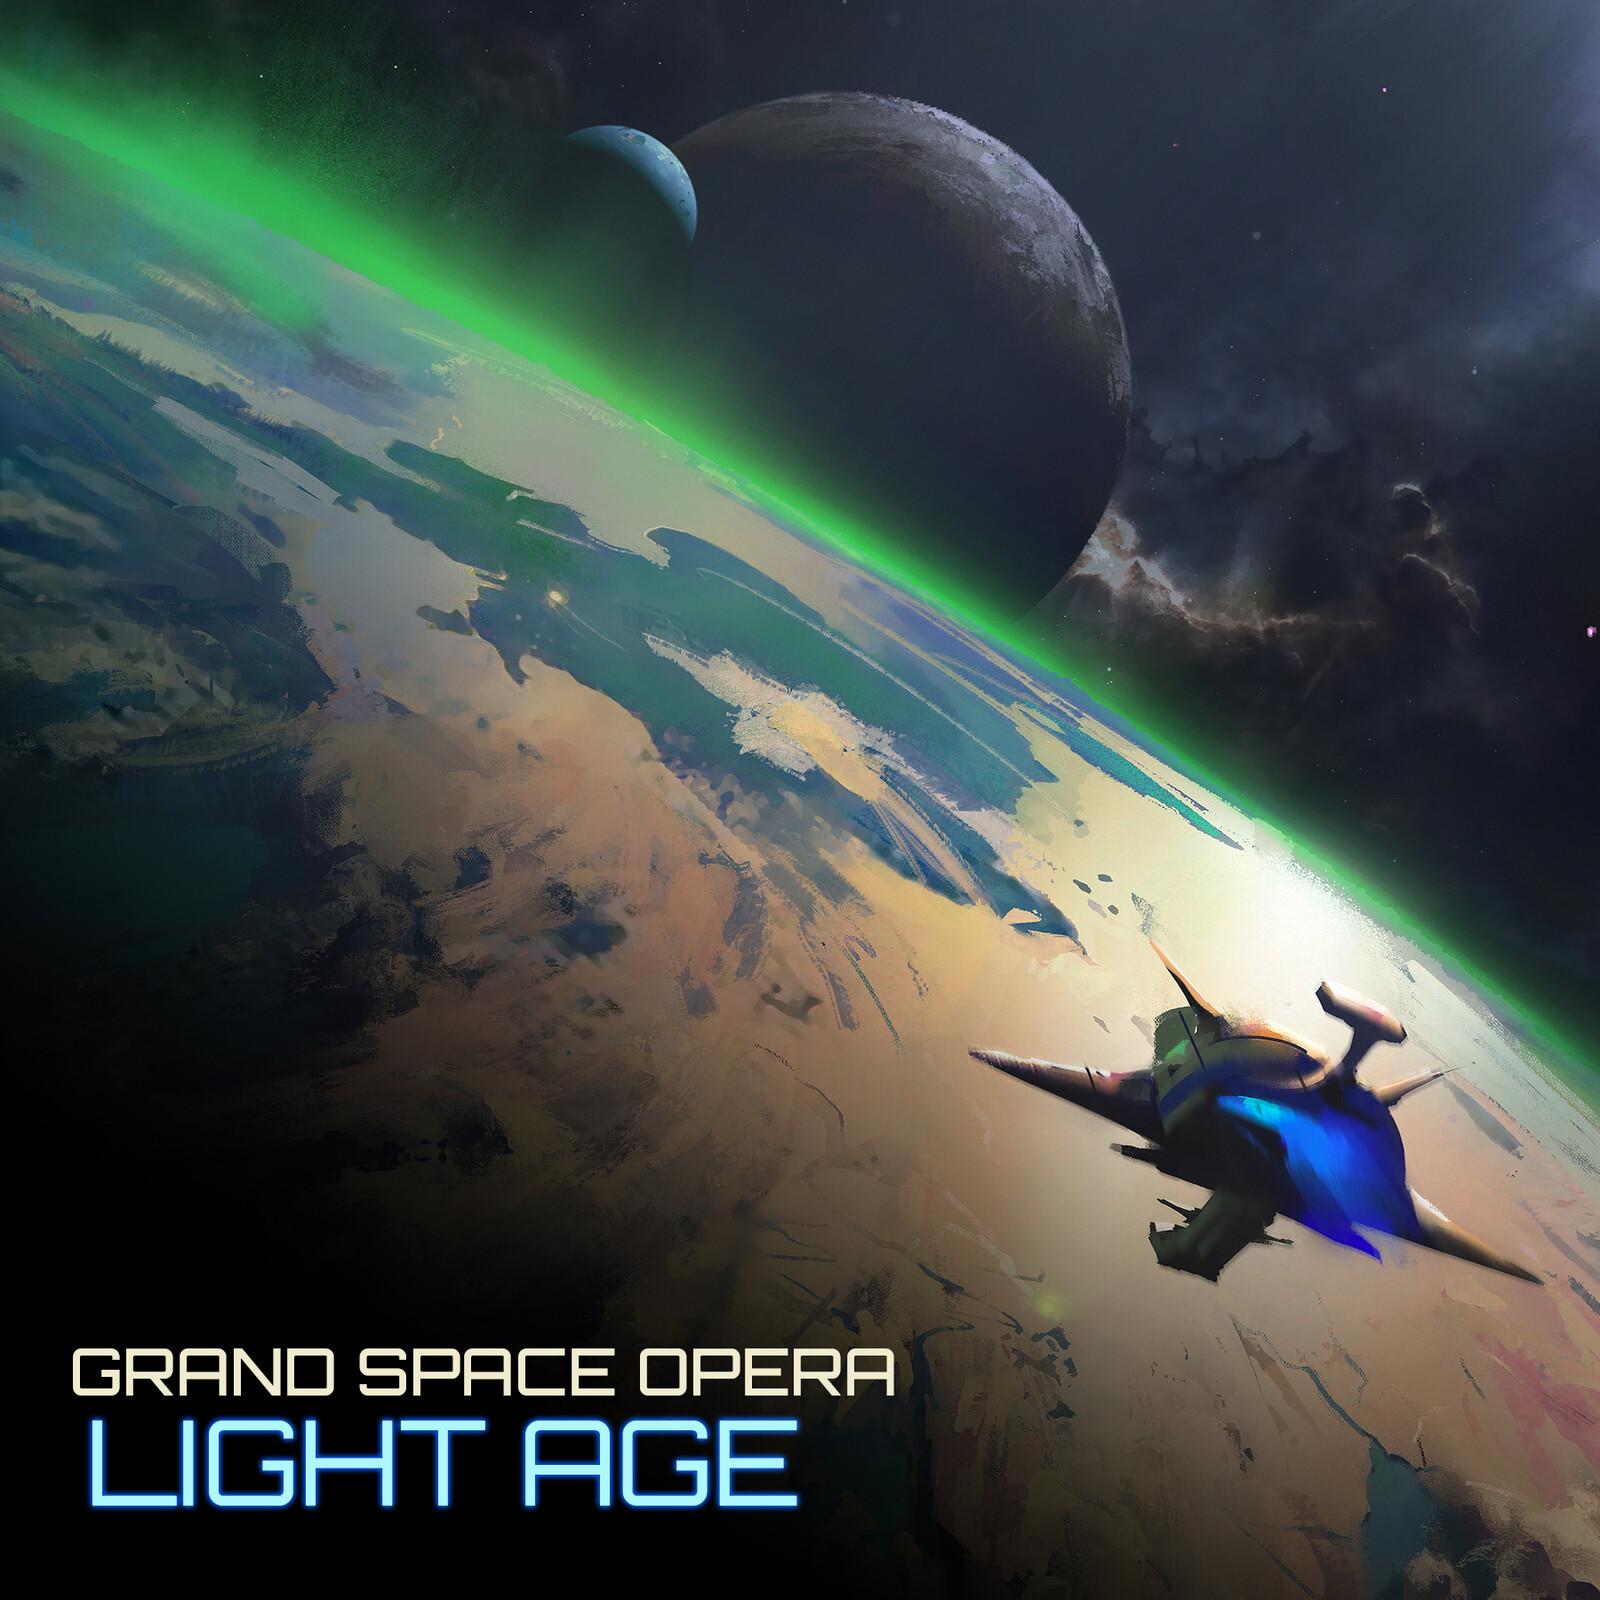 Grand Space Opera: Light Age - Keyframe Design